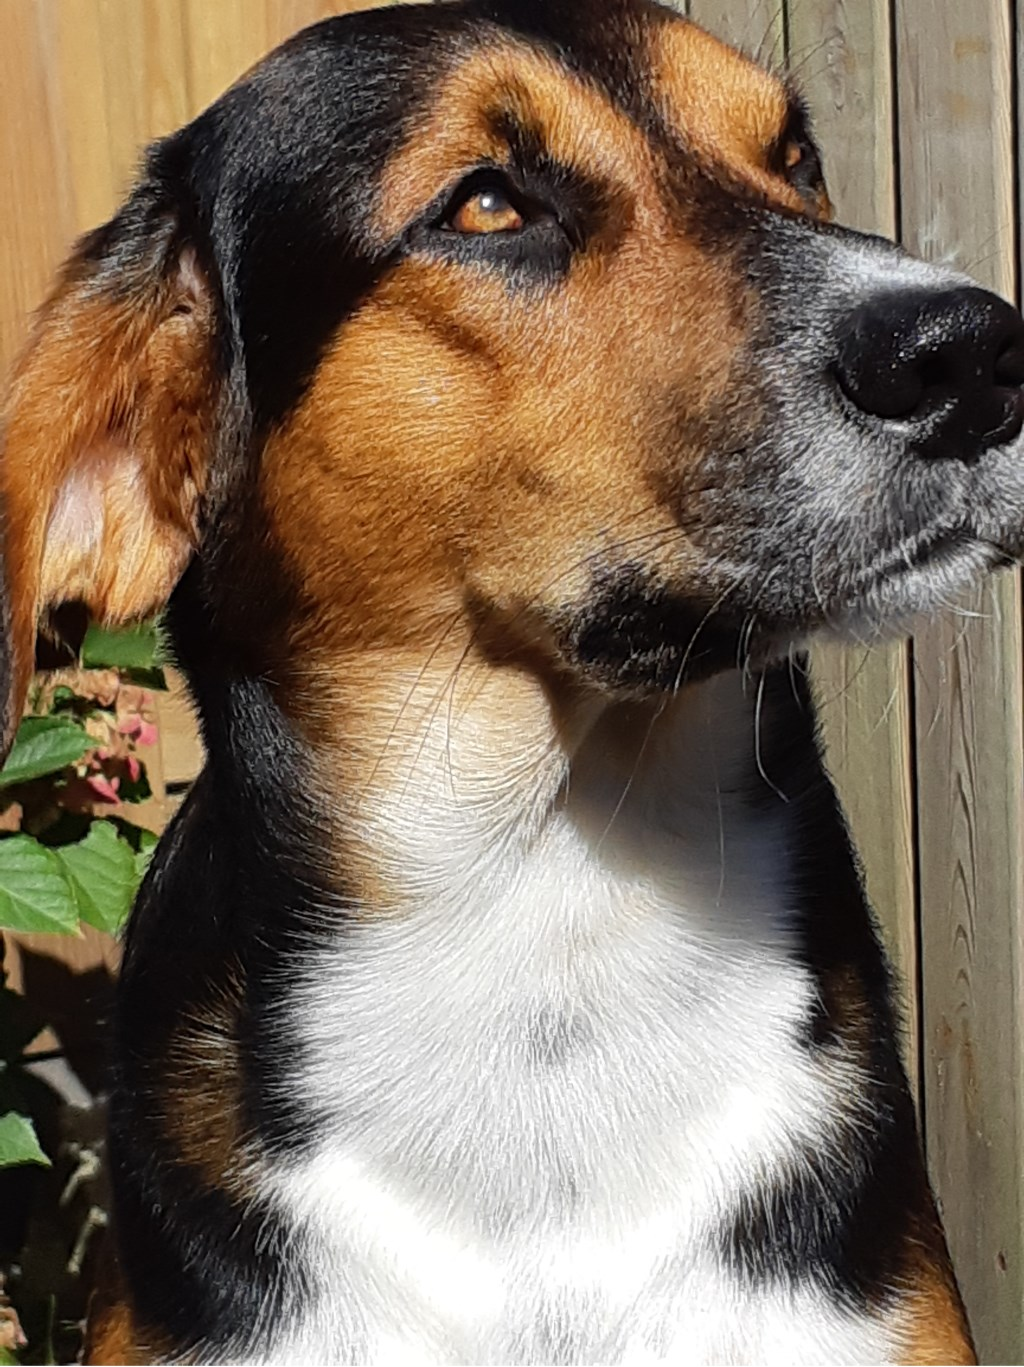 Onze lieve hond Charlie (Christel, Lara en Jens Kalff)  © deMooiLaarbeekkrant